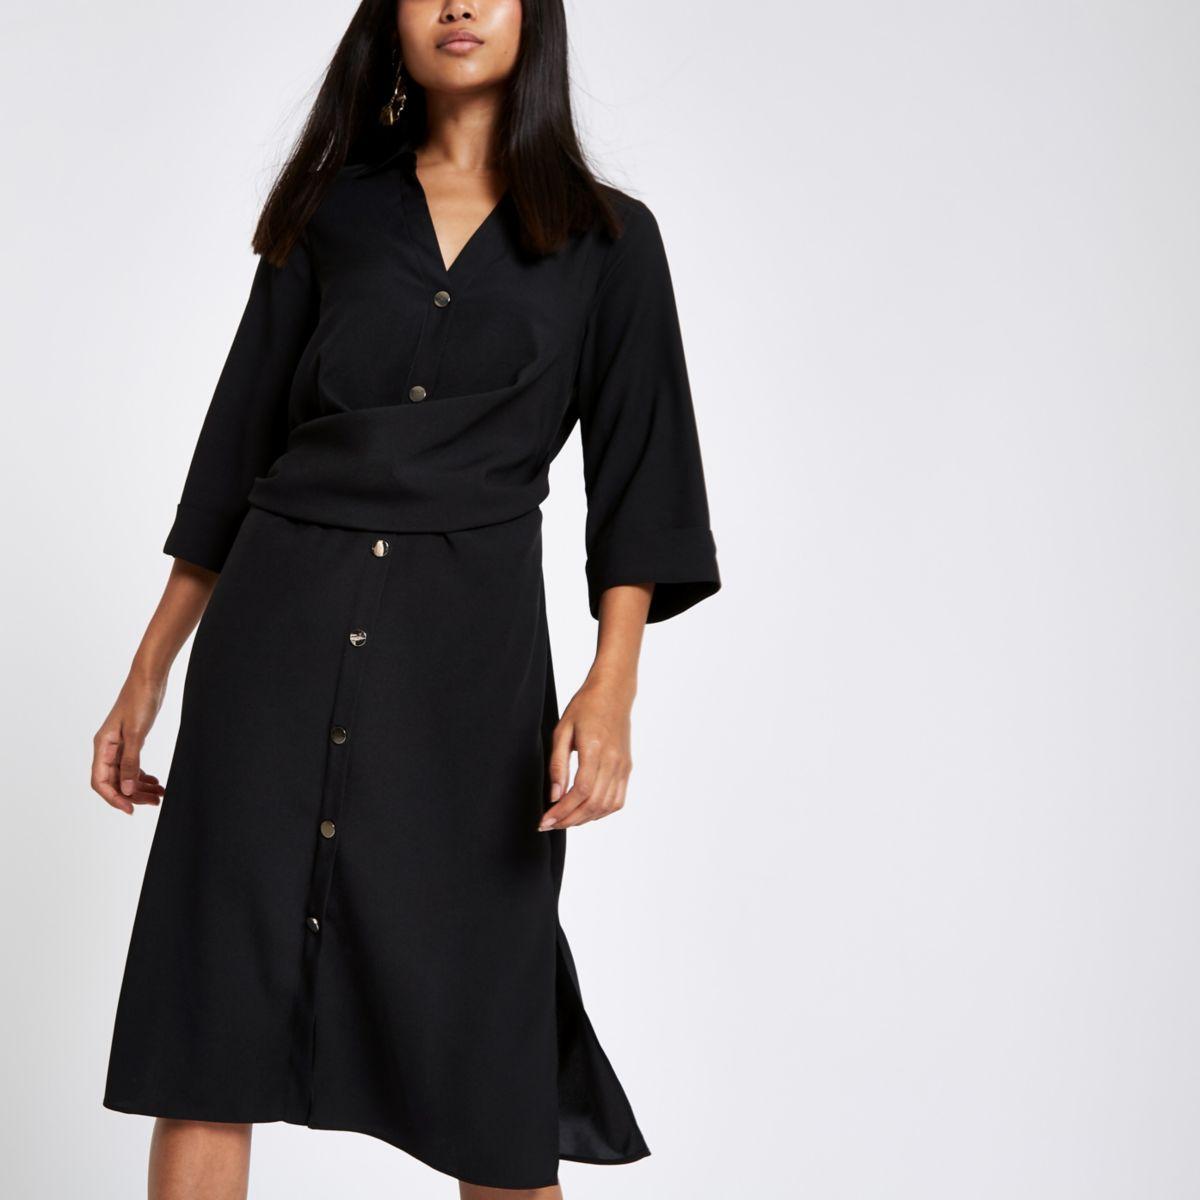 Petite black twist front shirt dress